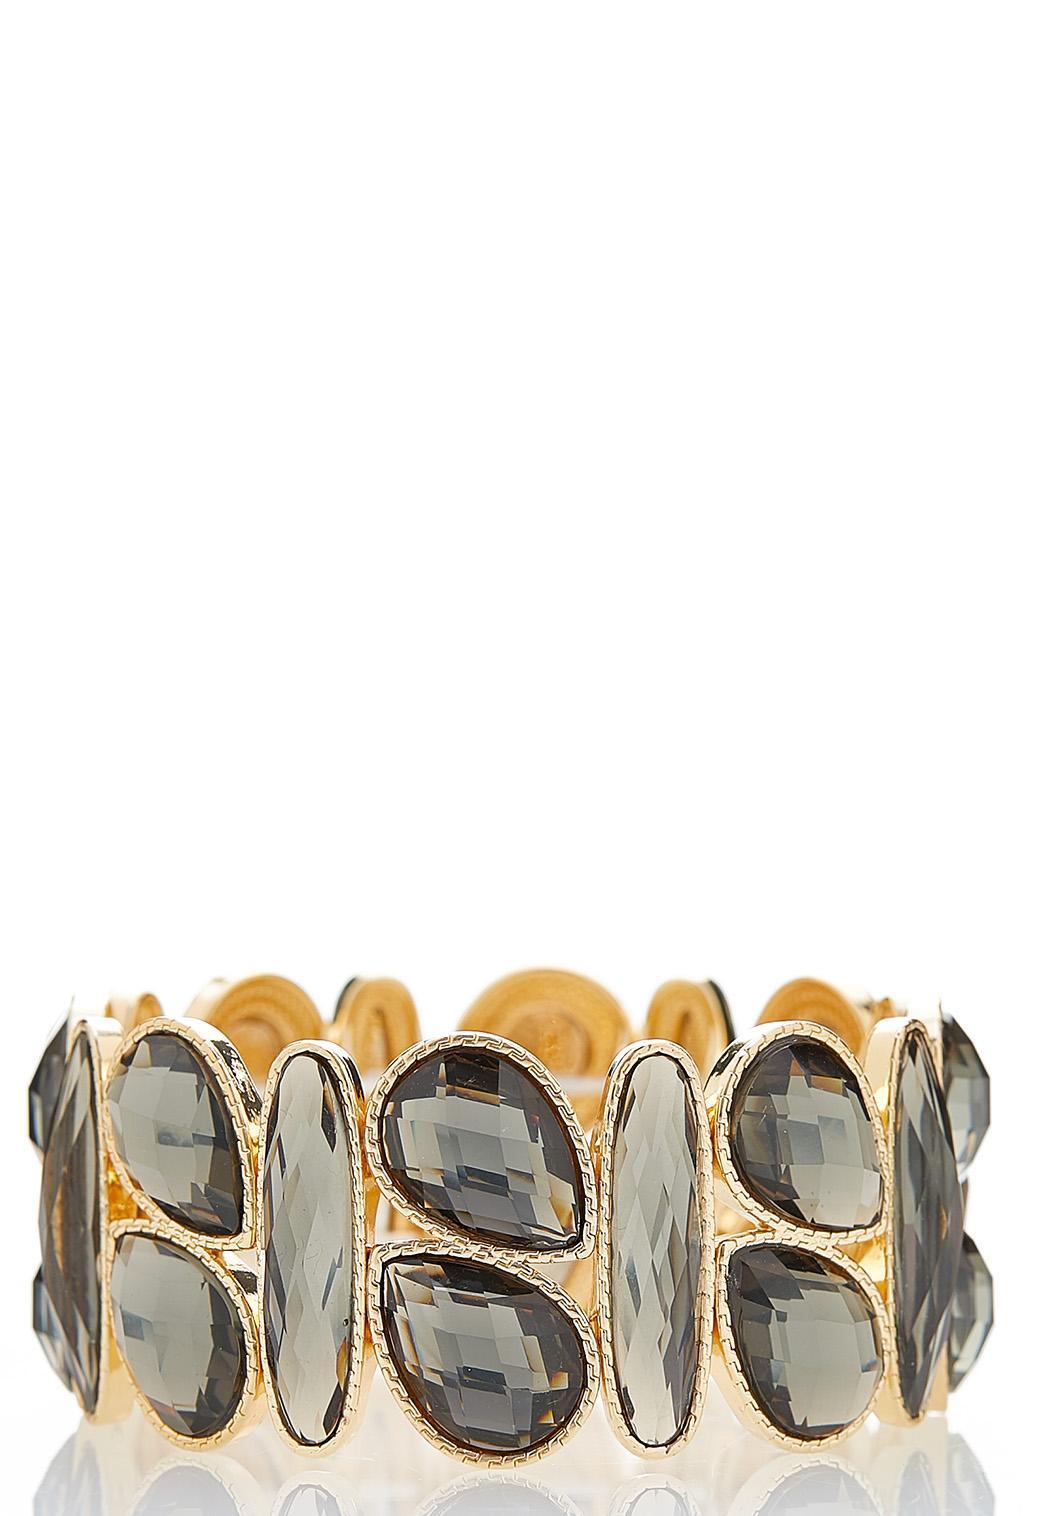 Faceted Acrylic Stretch Bracelet